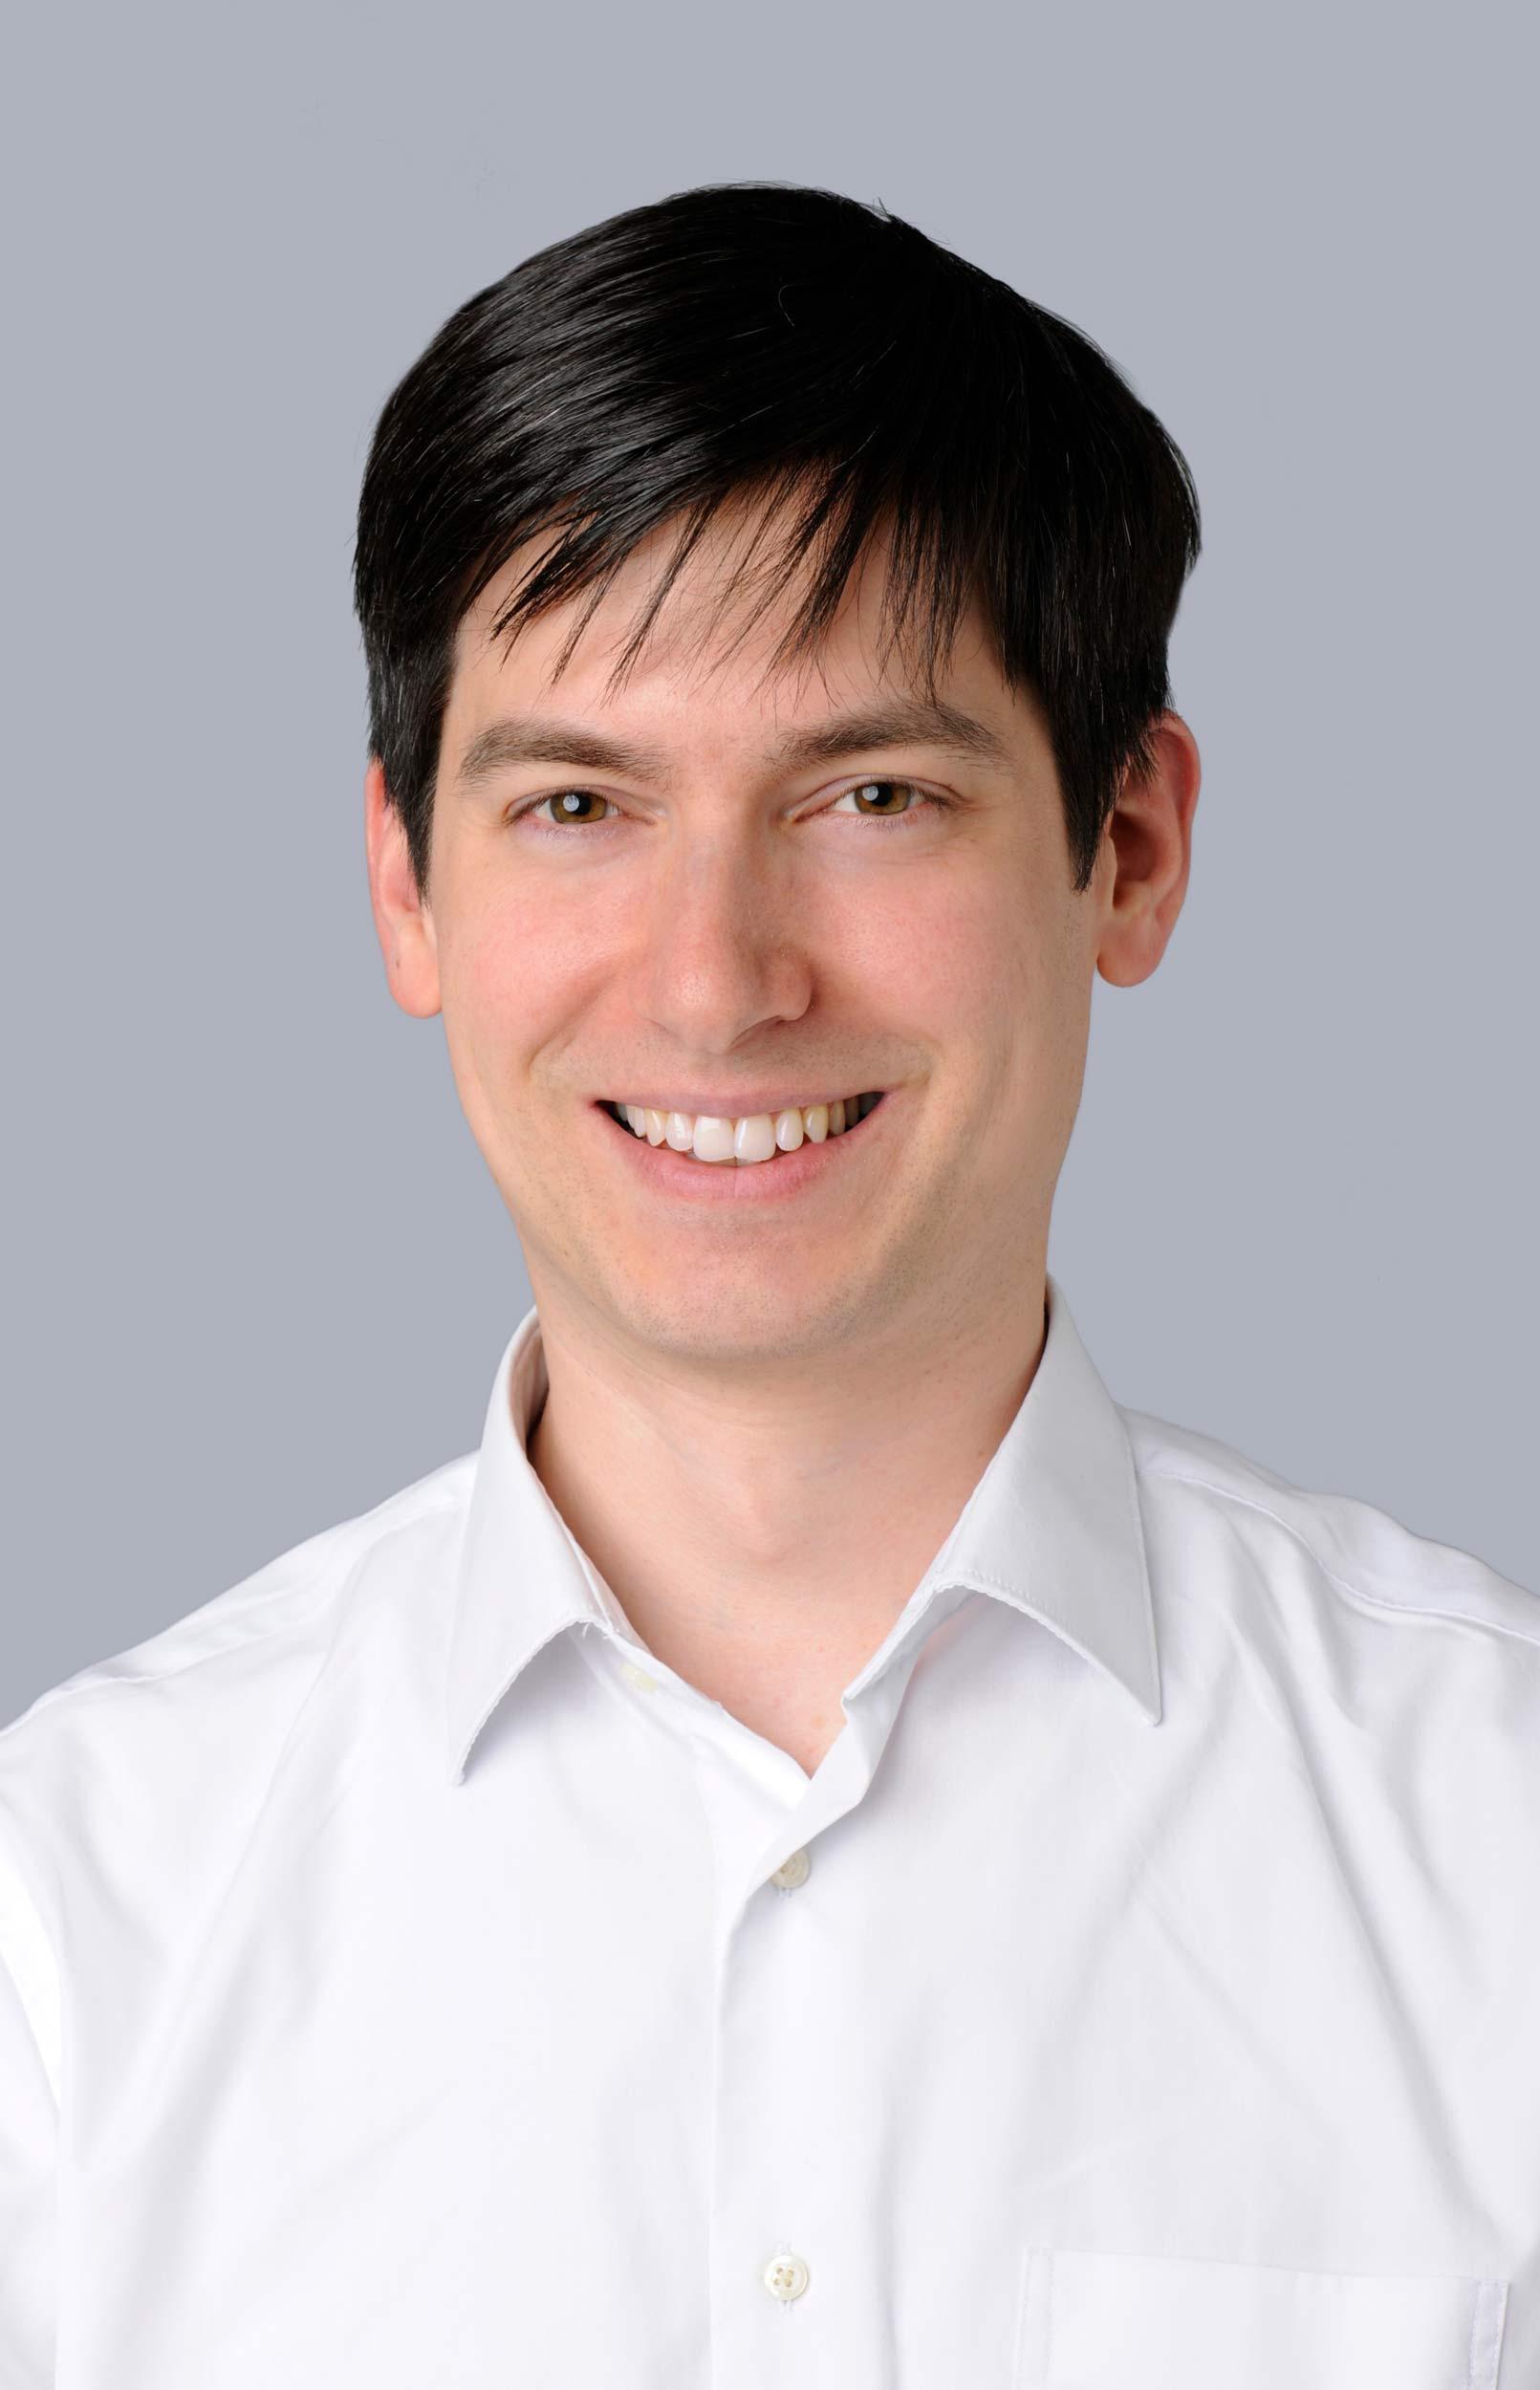 Manuel Mauch